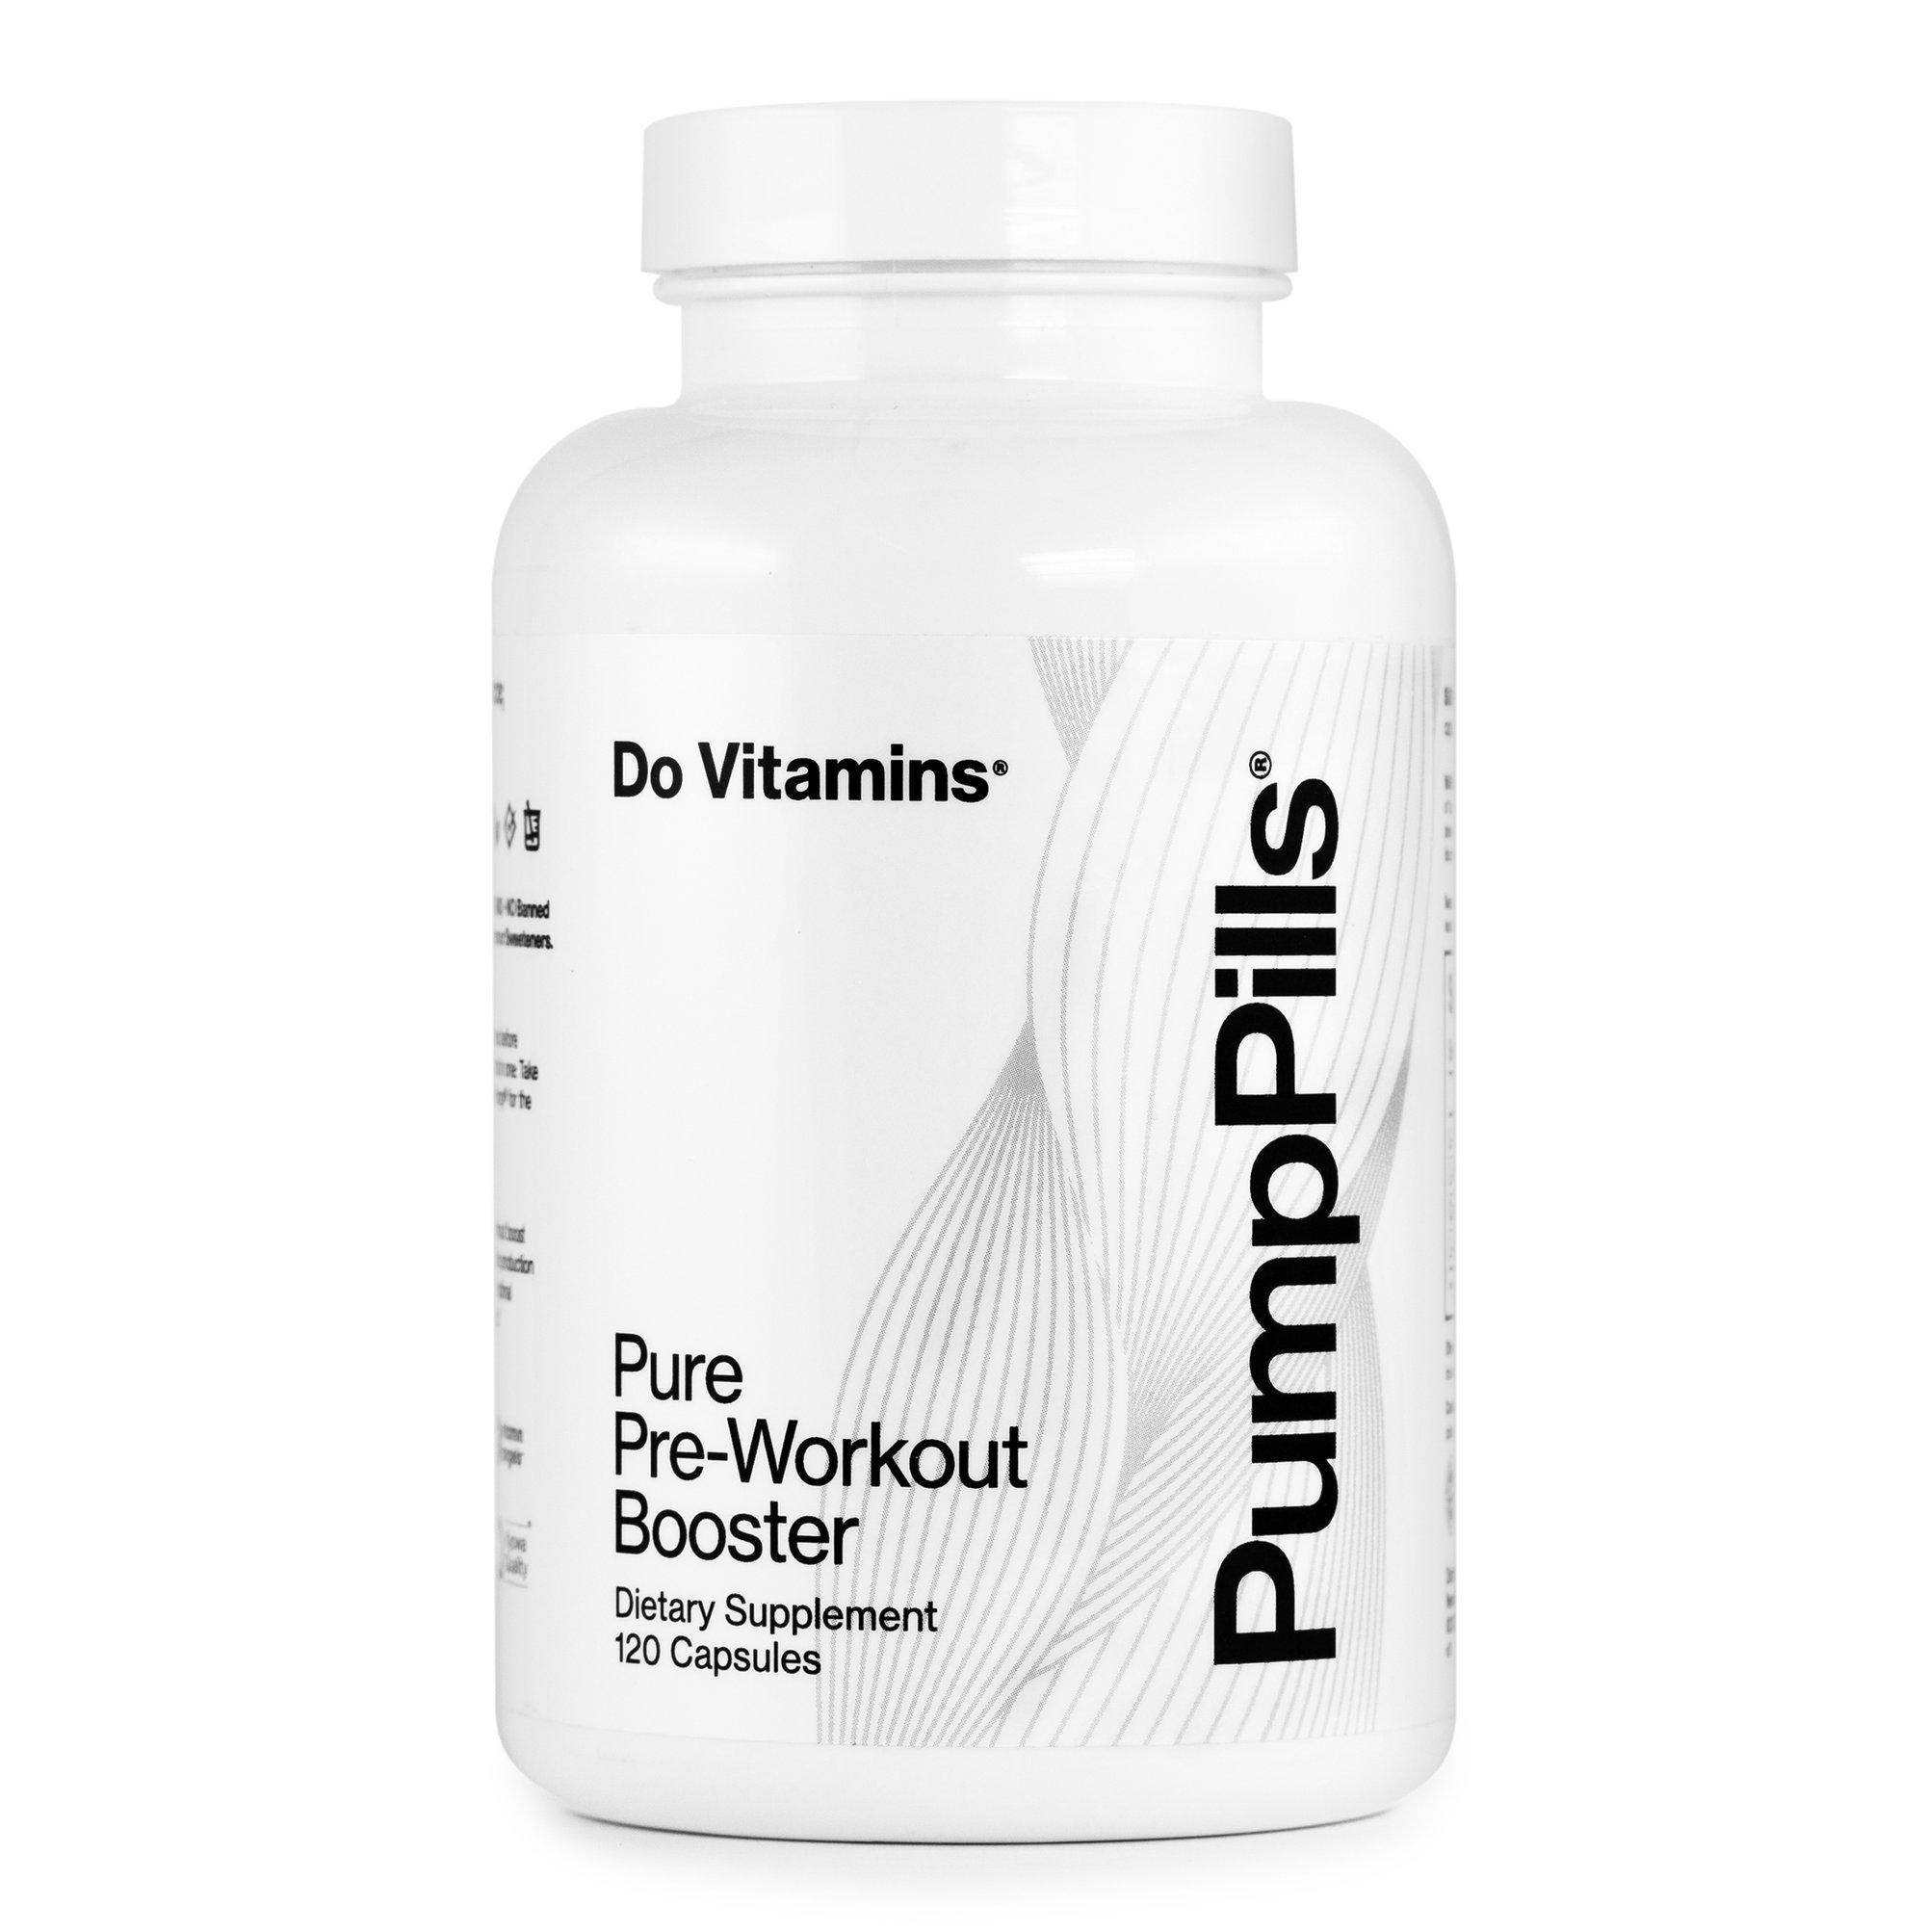 Pump Pills - Do Vitamins - Certified Paleo, Keto Certified, Paleo Friendly, PaleoVegan by the Paleo Foundation